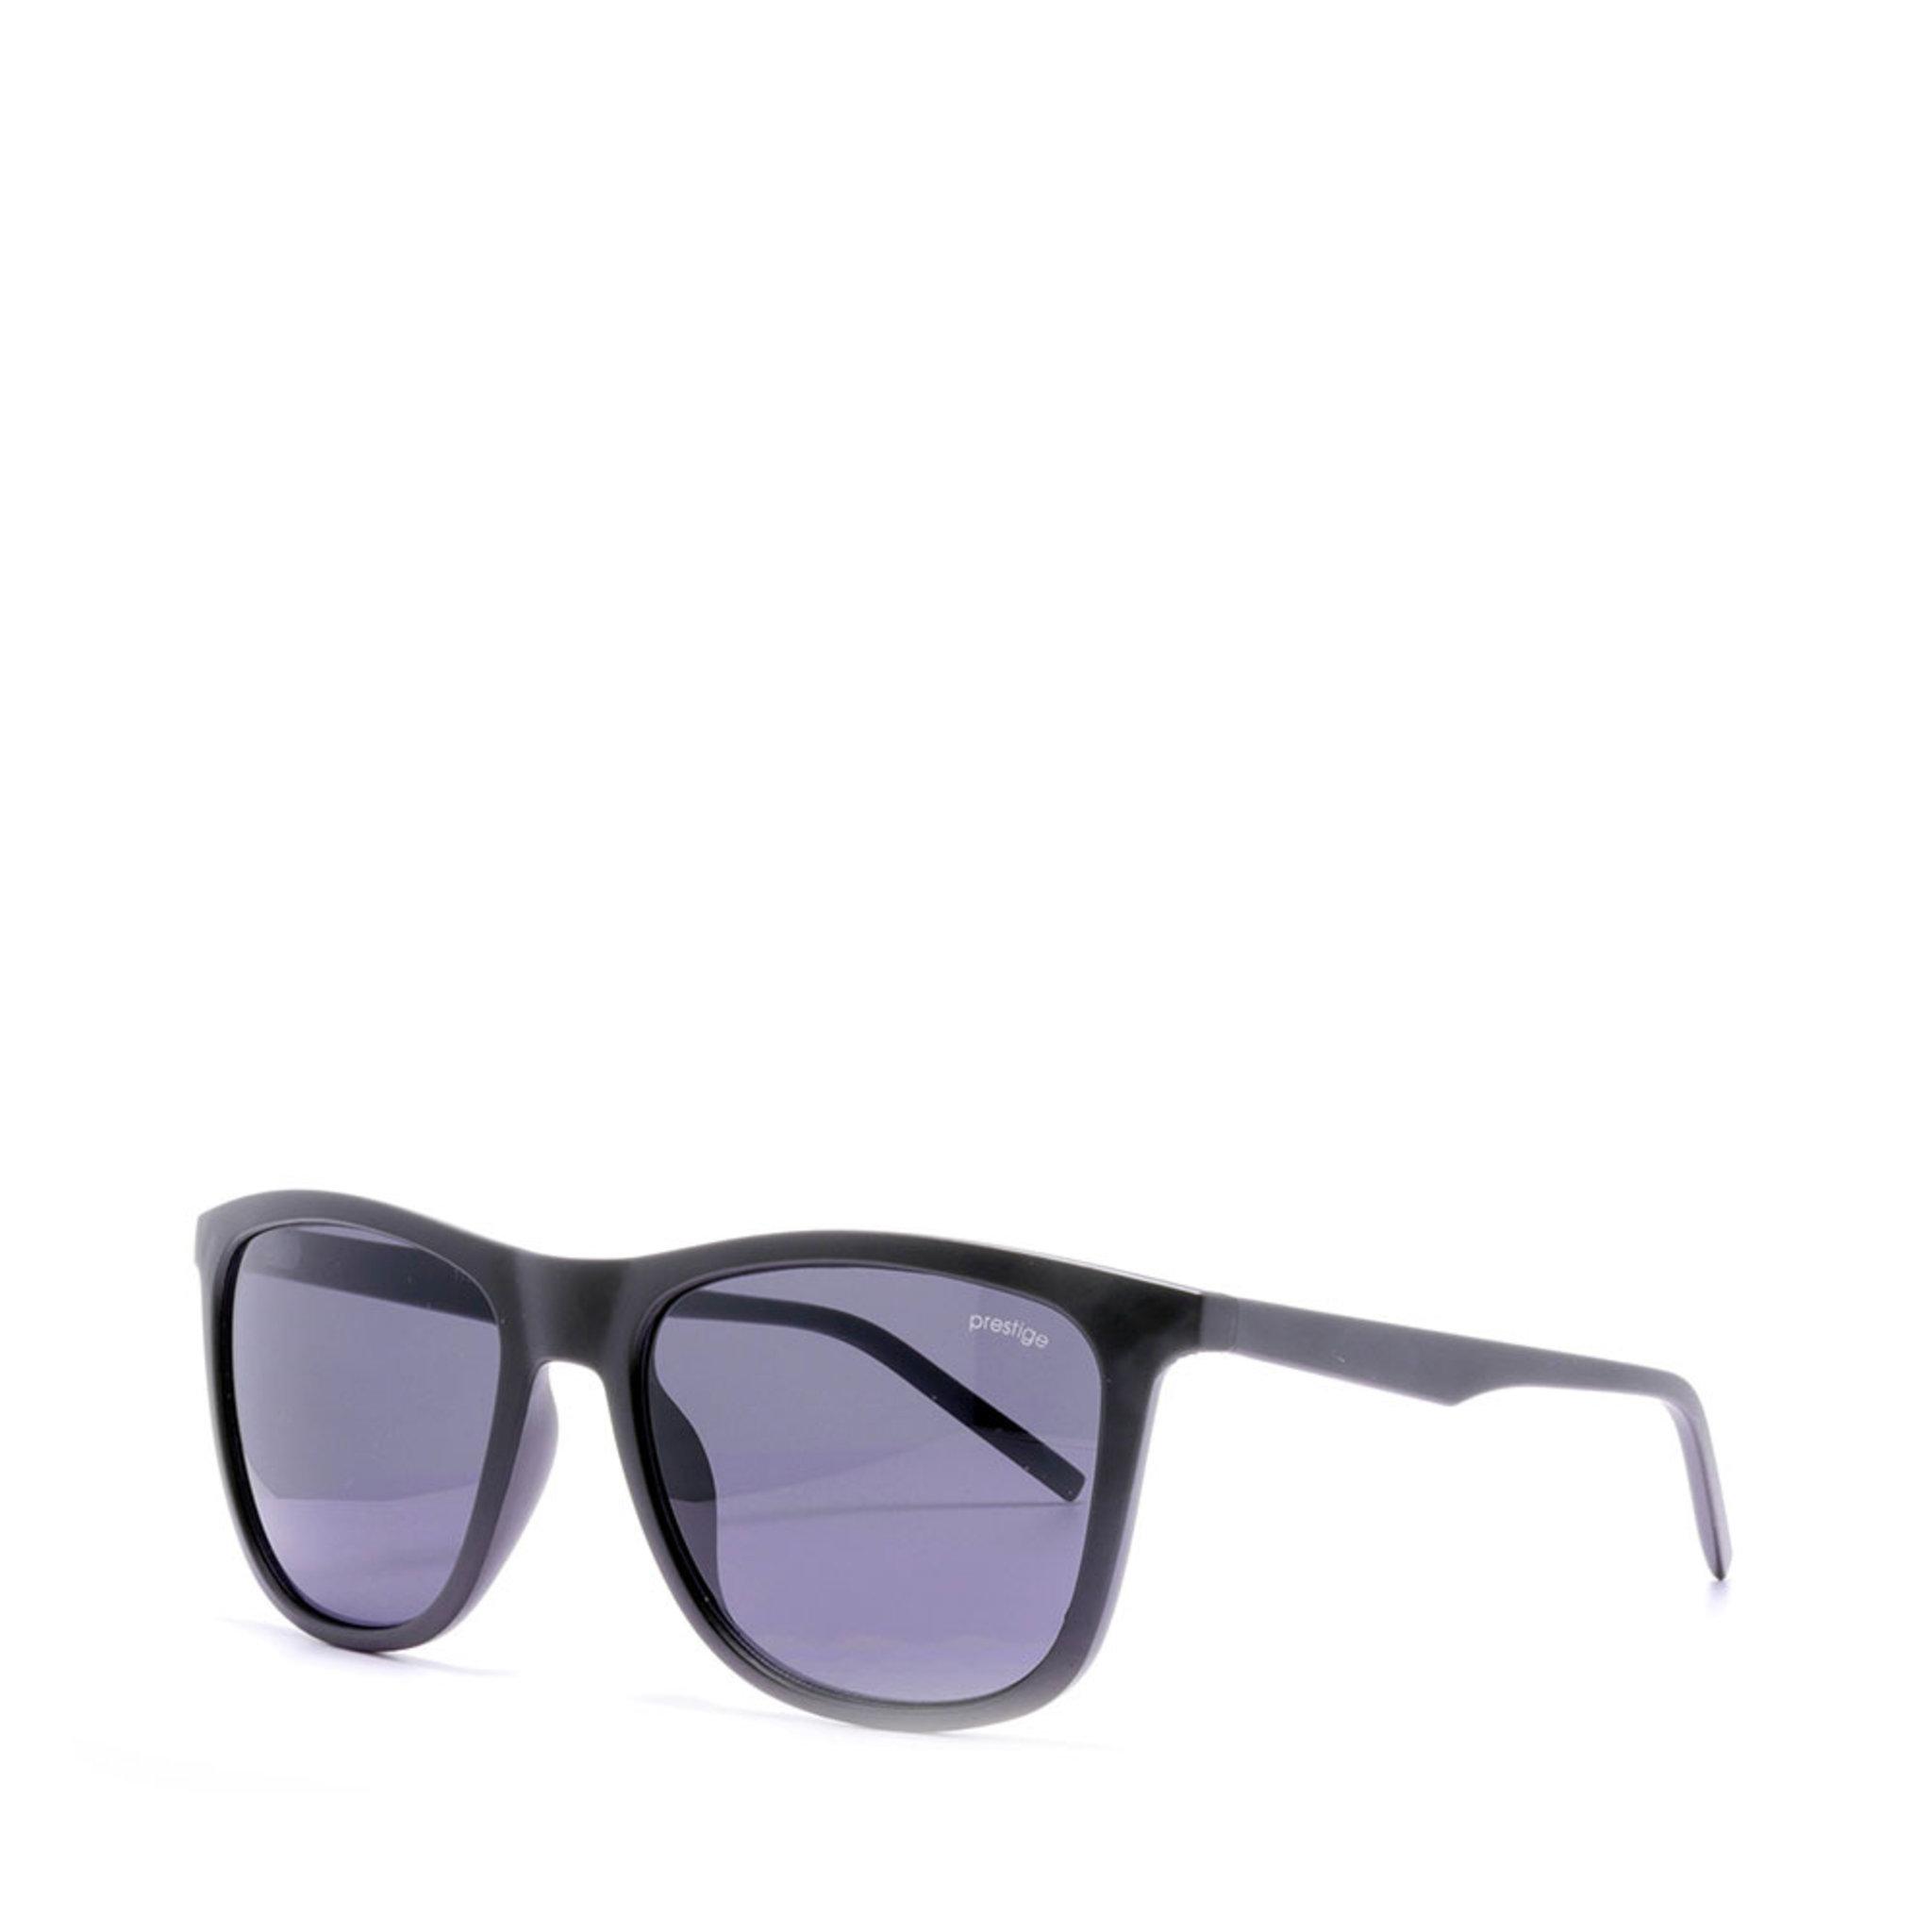 Lori Black Sunglasses